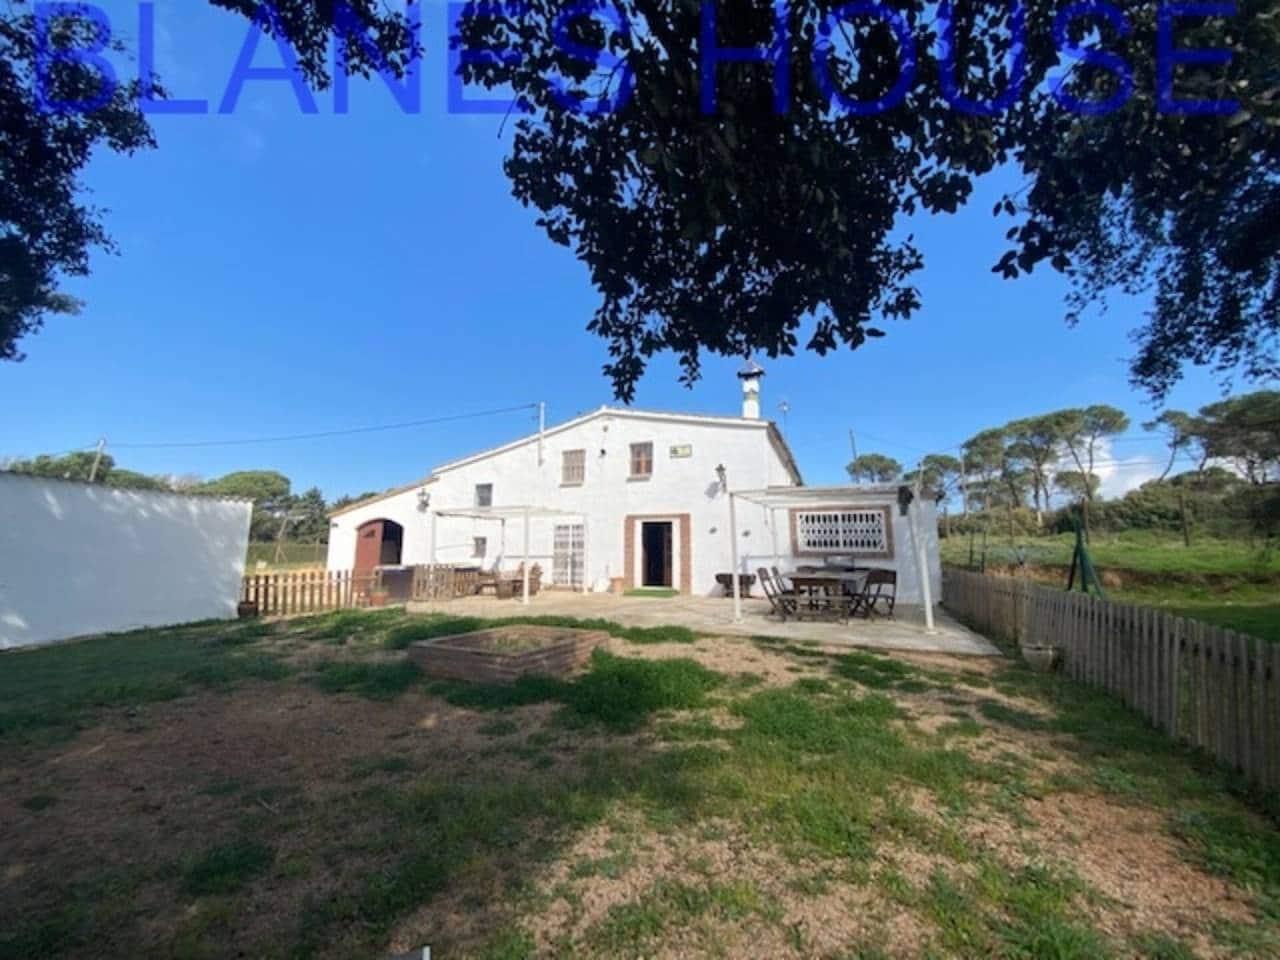 5 bedroom Finca/Country House for sale in Macanet de la Selva with pool - € 425,000 (Ref: 5969743)